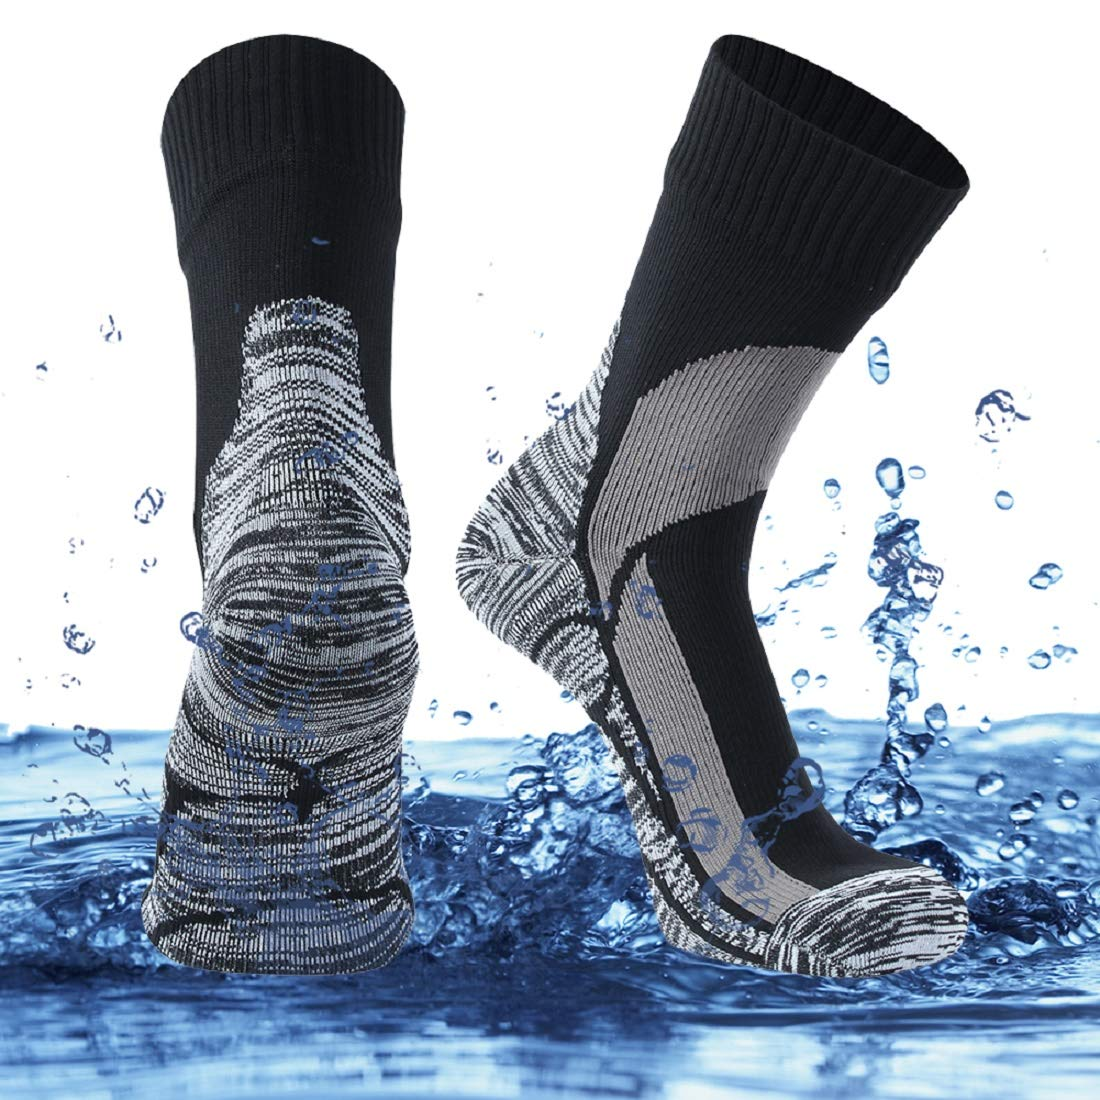 SuMade Waterproof Sports Socks, Womens Mens Lightweight Thick Cushioned Soft Moisture Wicking Comfortable Skiing Kayaking Hiking Outdoor Socks 1 Pair (Black, Medium) by SuMade